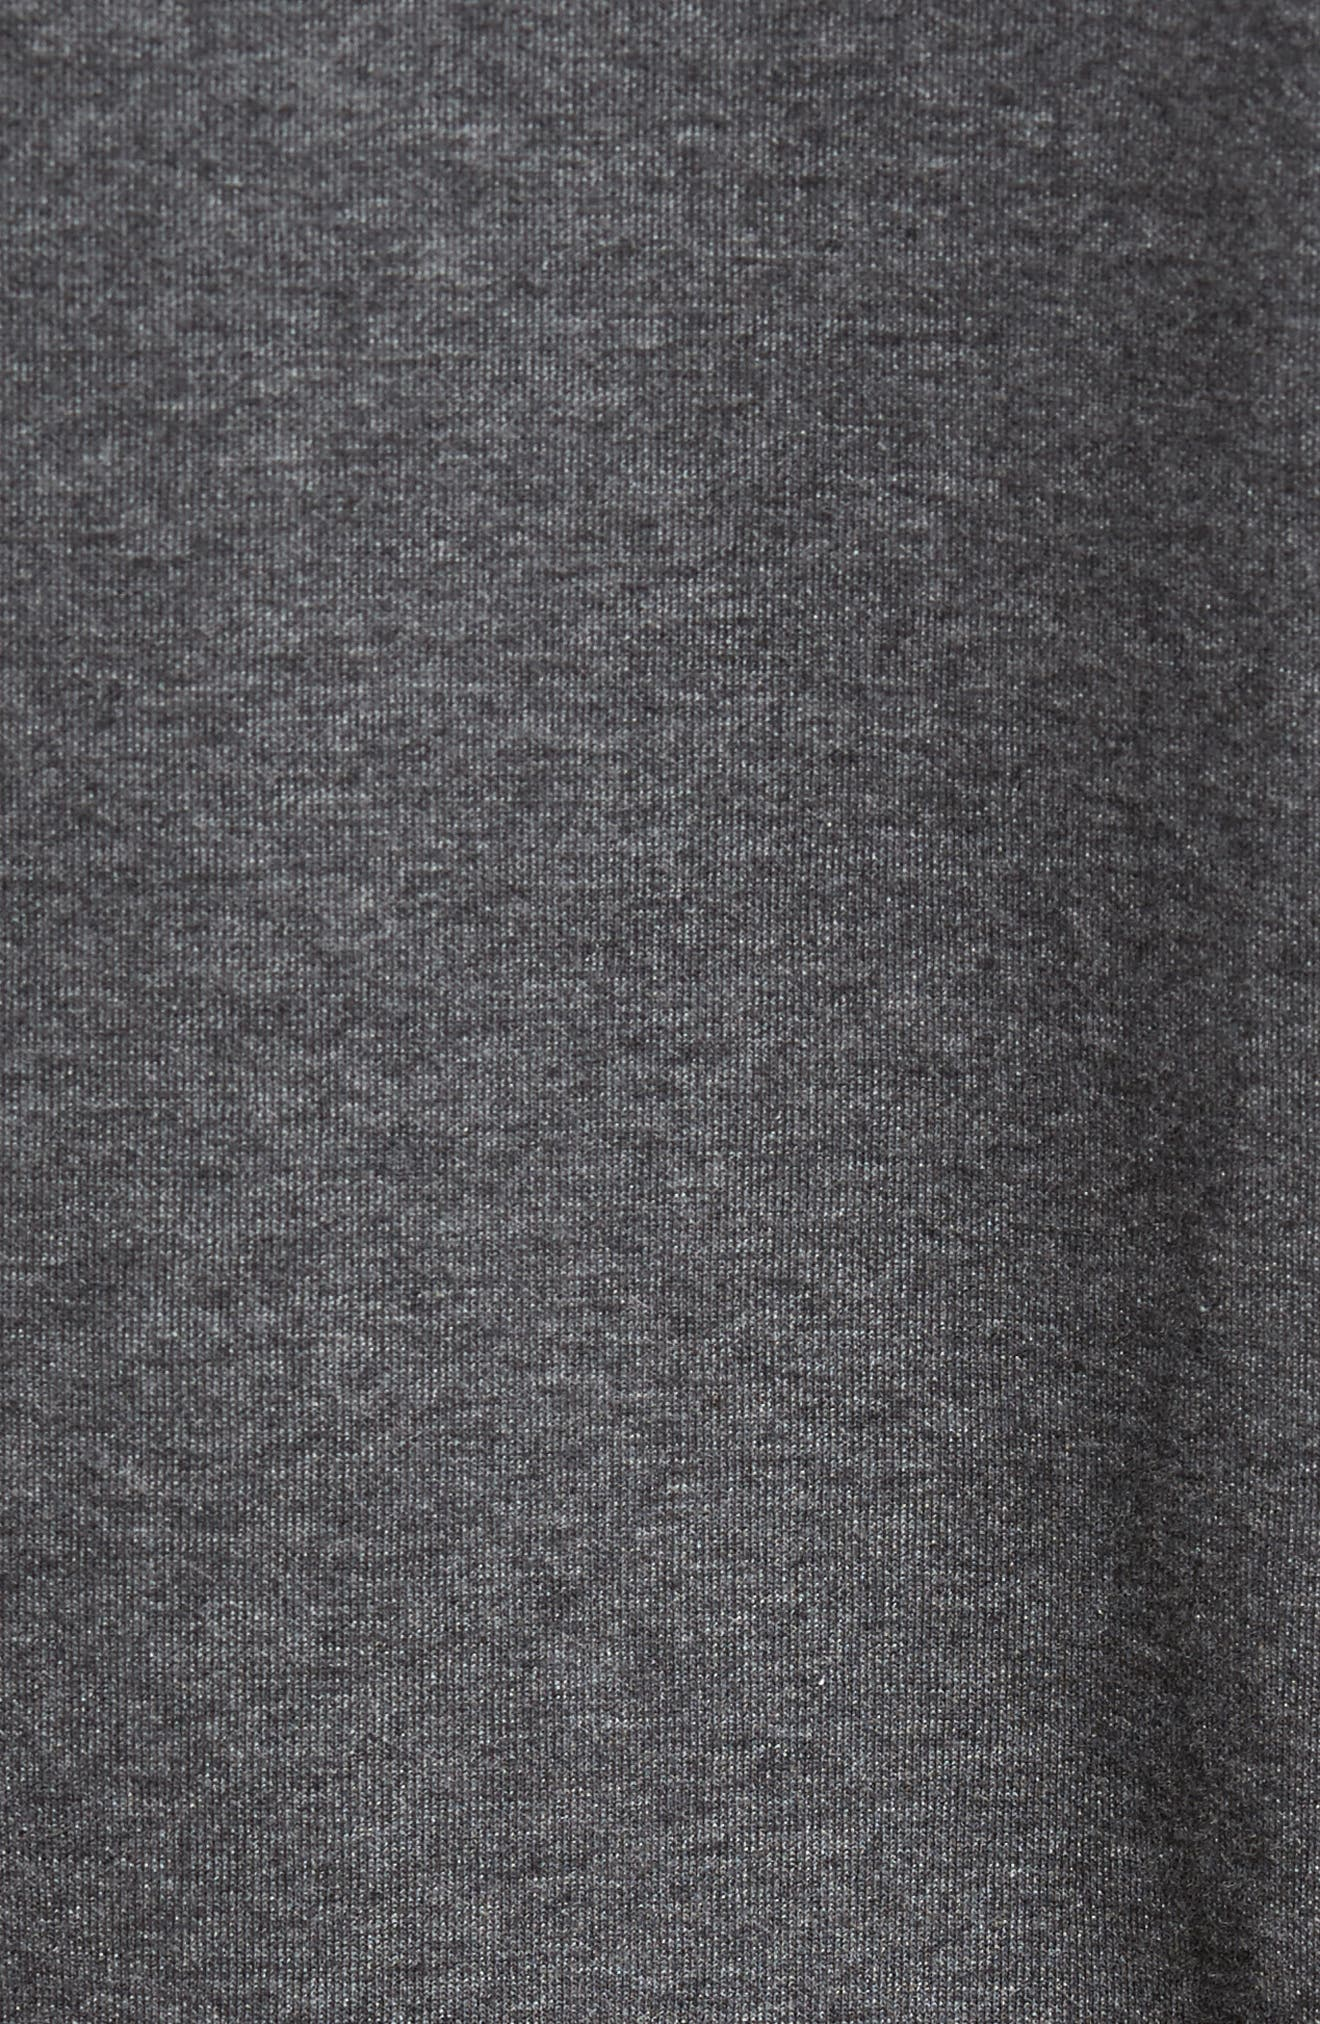 Zip Up Fleece,                             Alternate thumbnail 5, color,                             Dark Melange